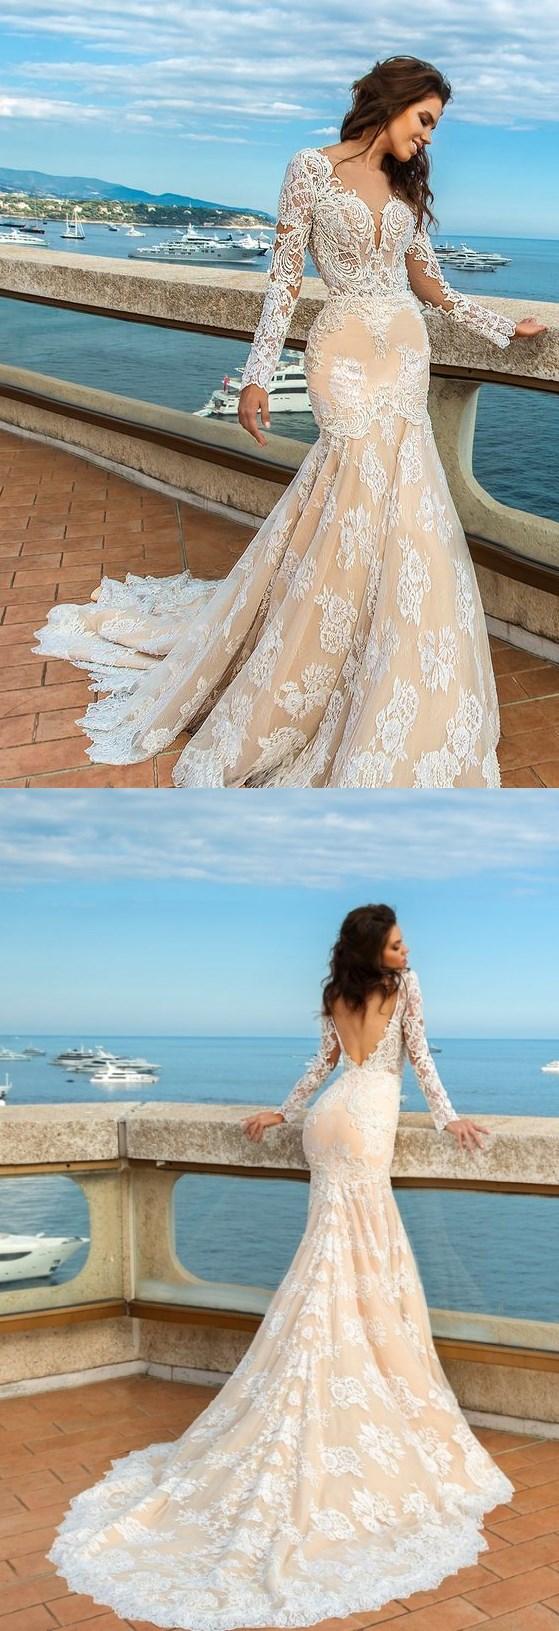 Champagne Wedding Dress,Long Sleeve Appliques Wedding Dresses,Open ...